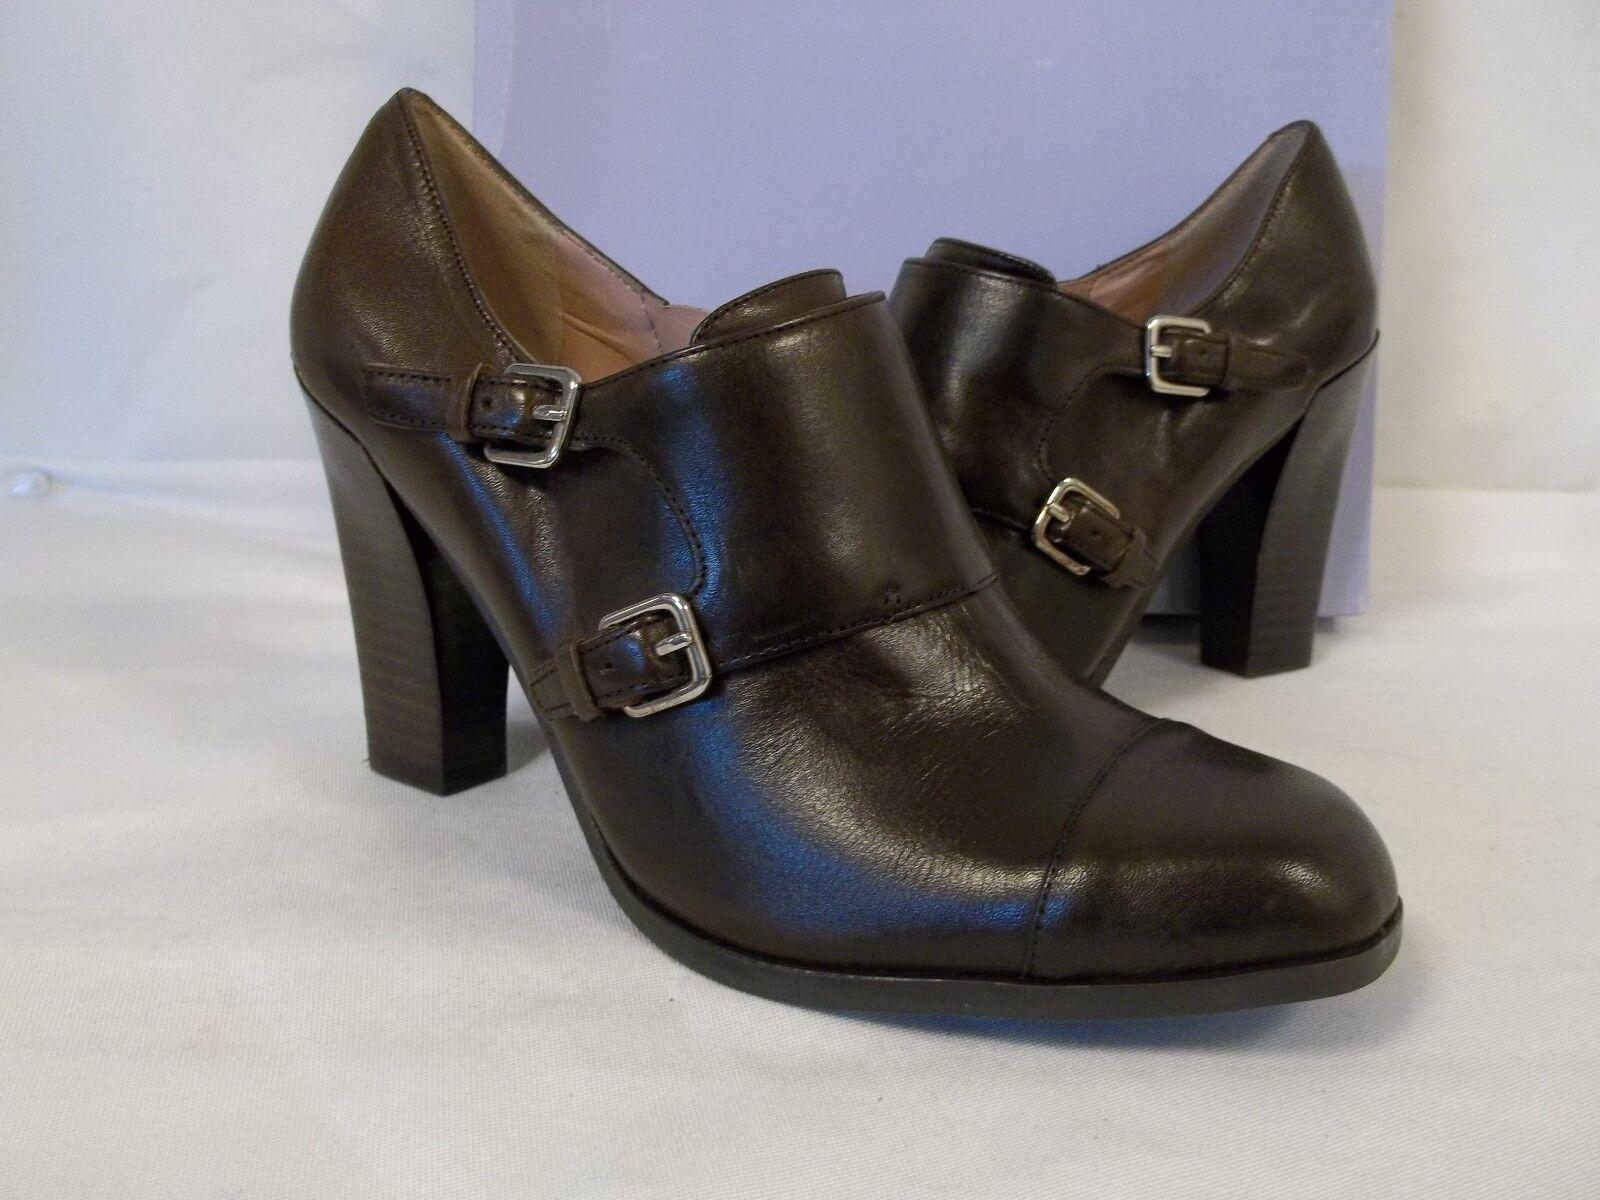 Marc Fisher Taille 8 M Sauce Dark marron Leather Heels New femmes chaussures